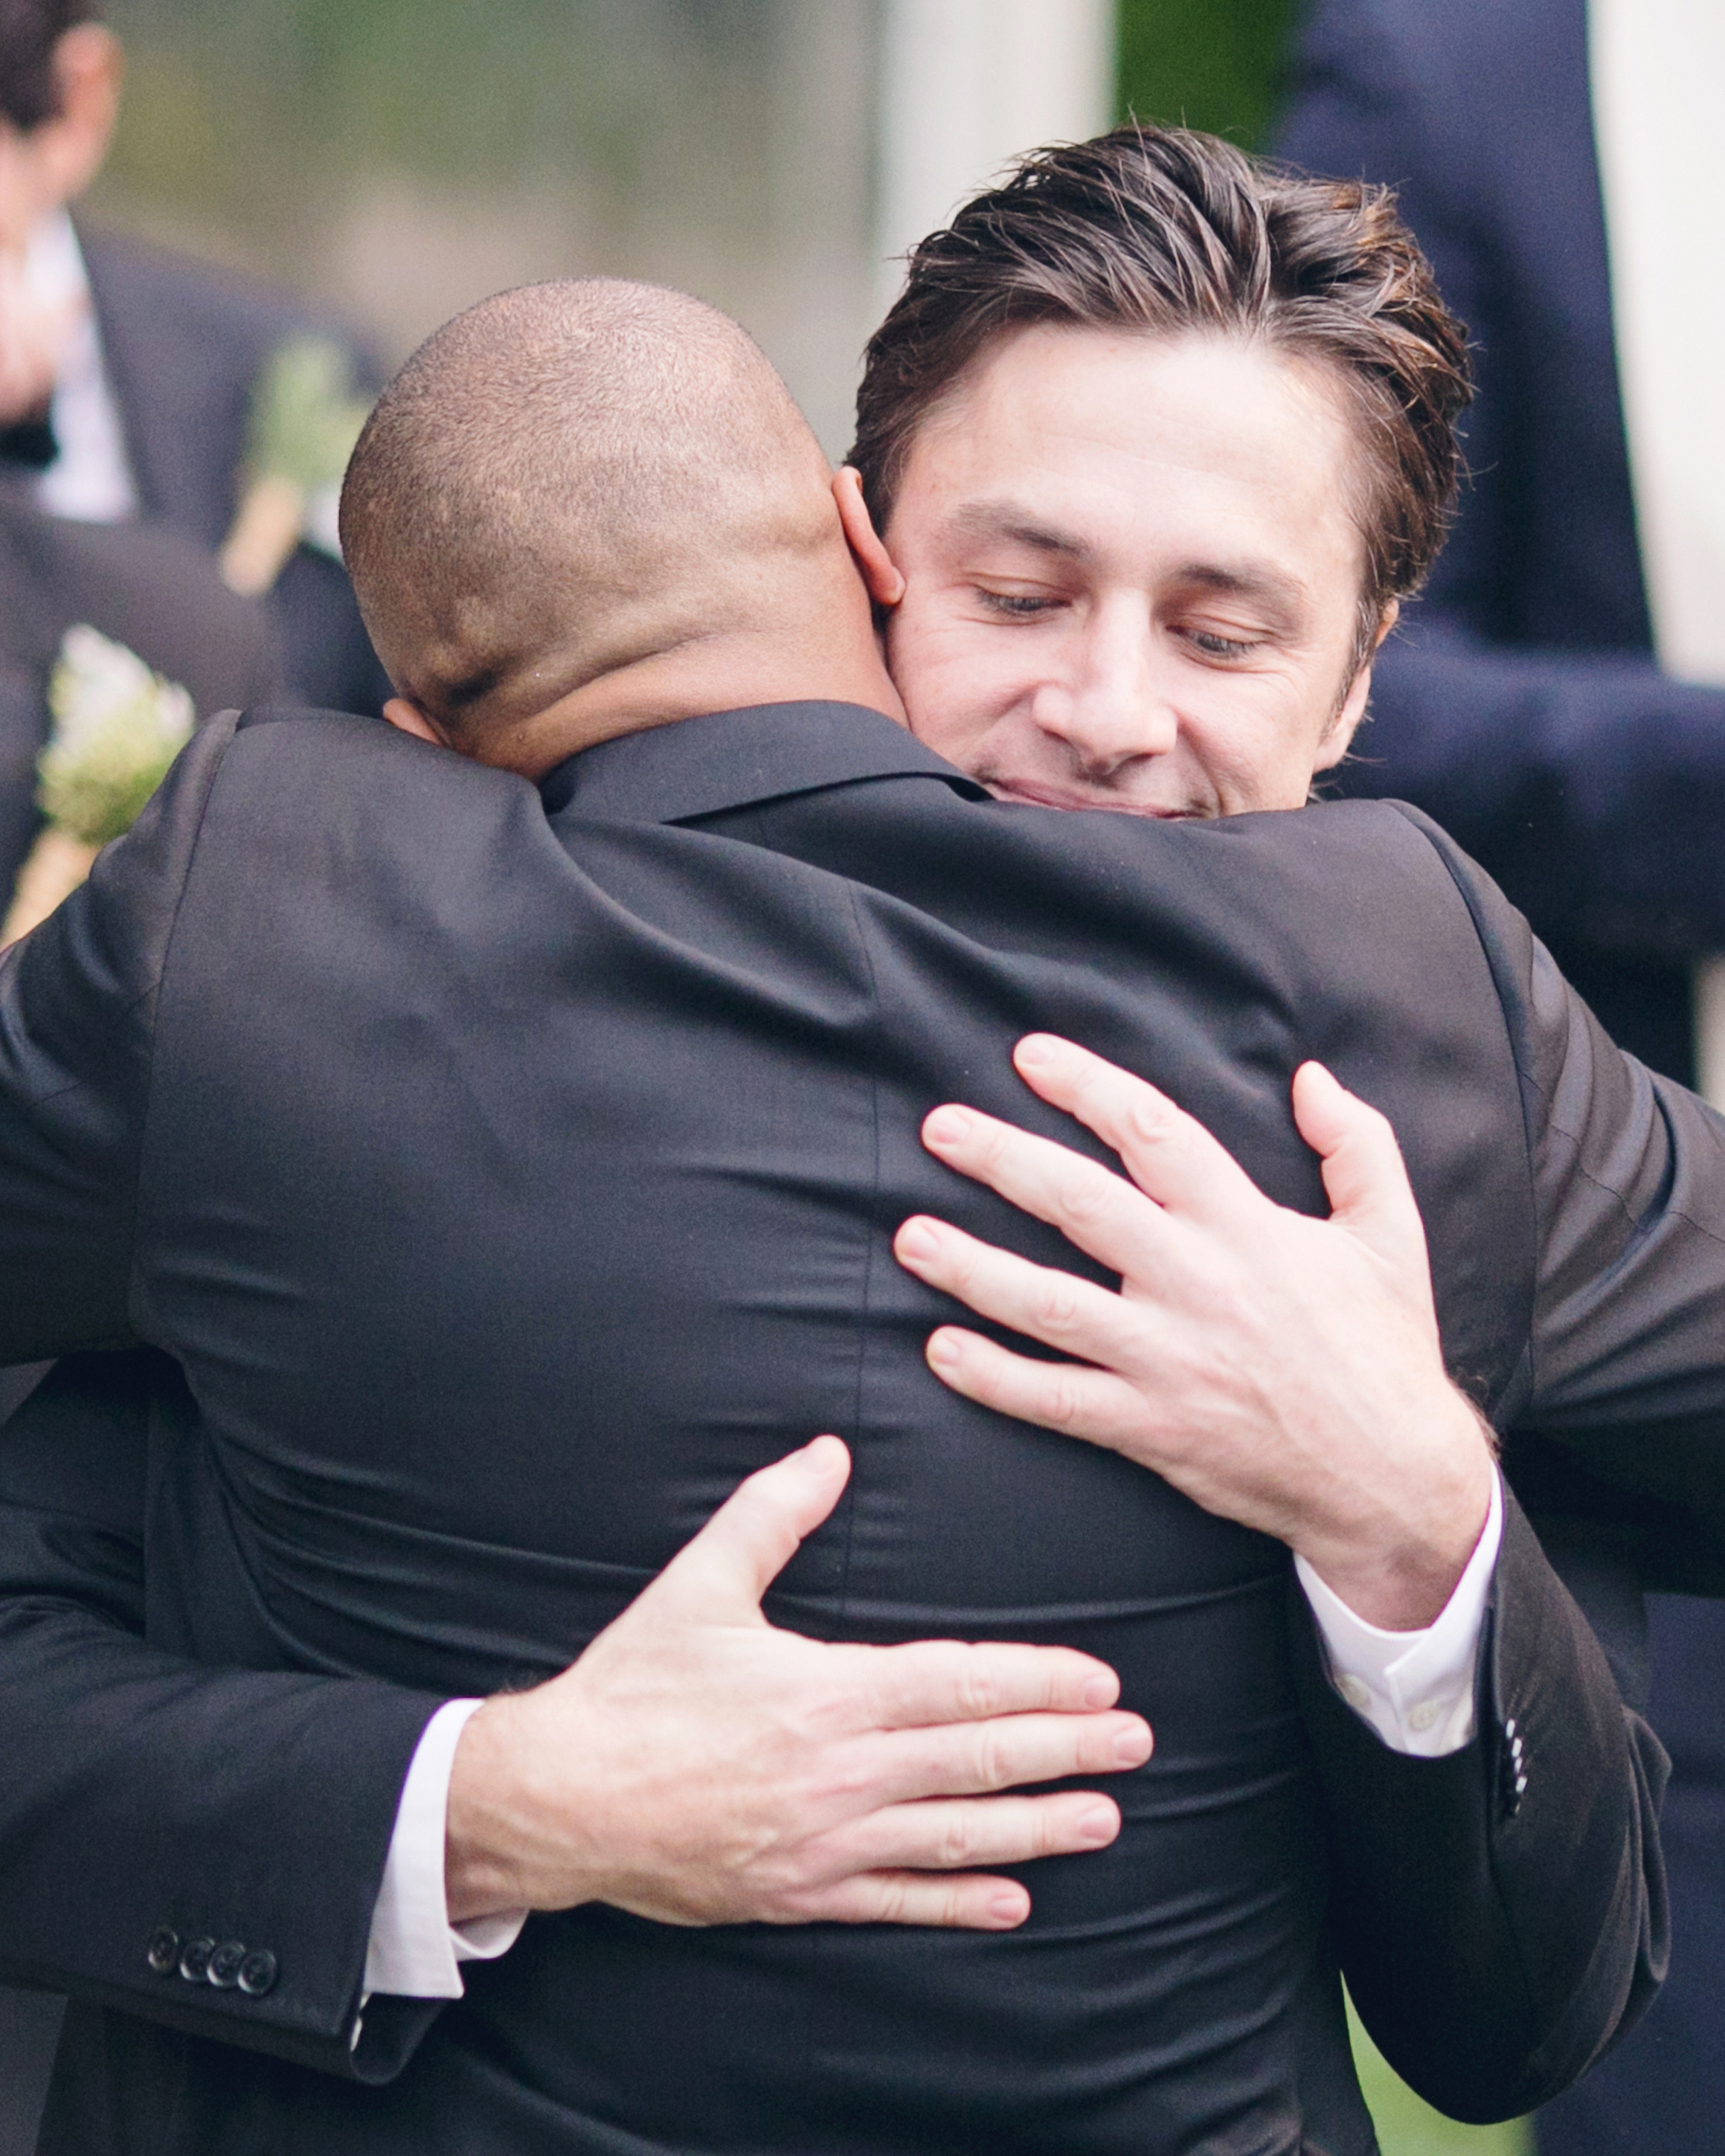 cacee-donald-best-man-hug-113-wds110101.jpg